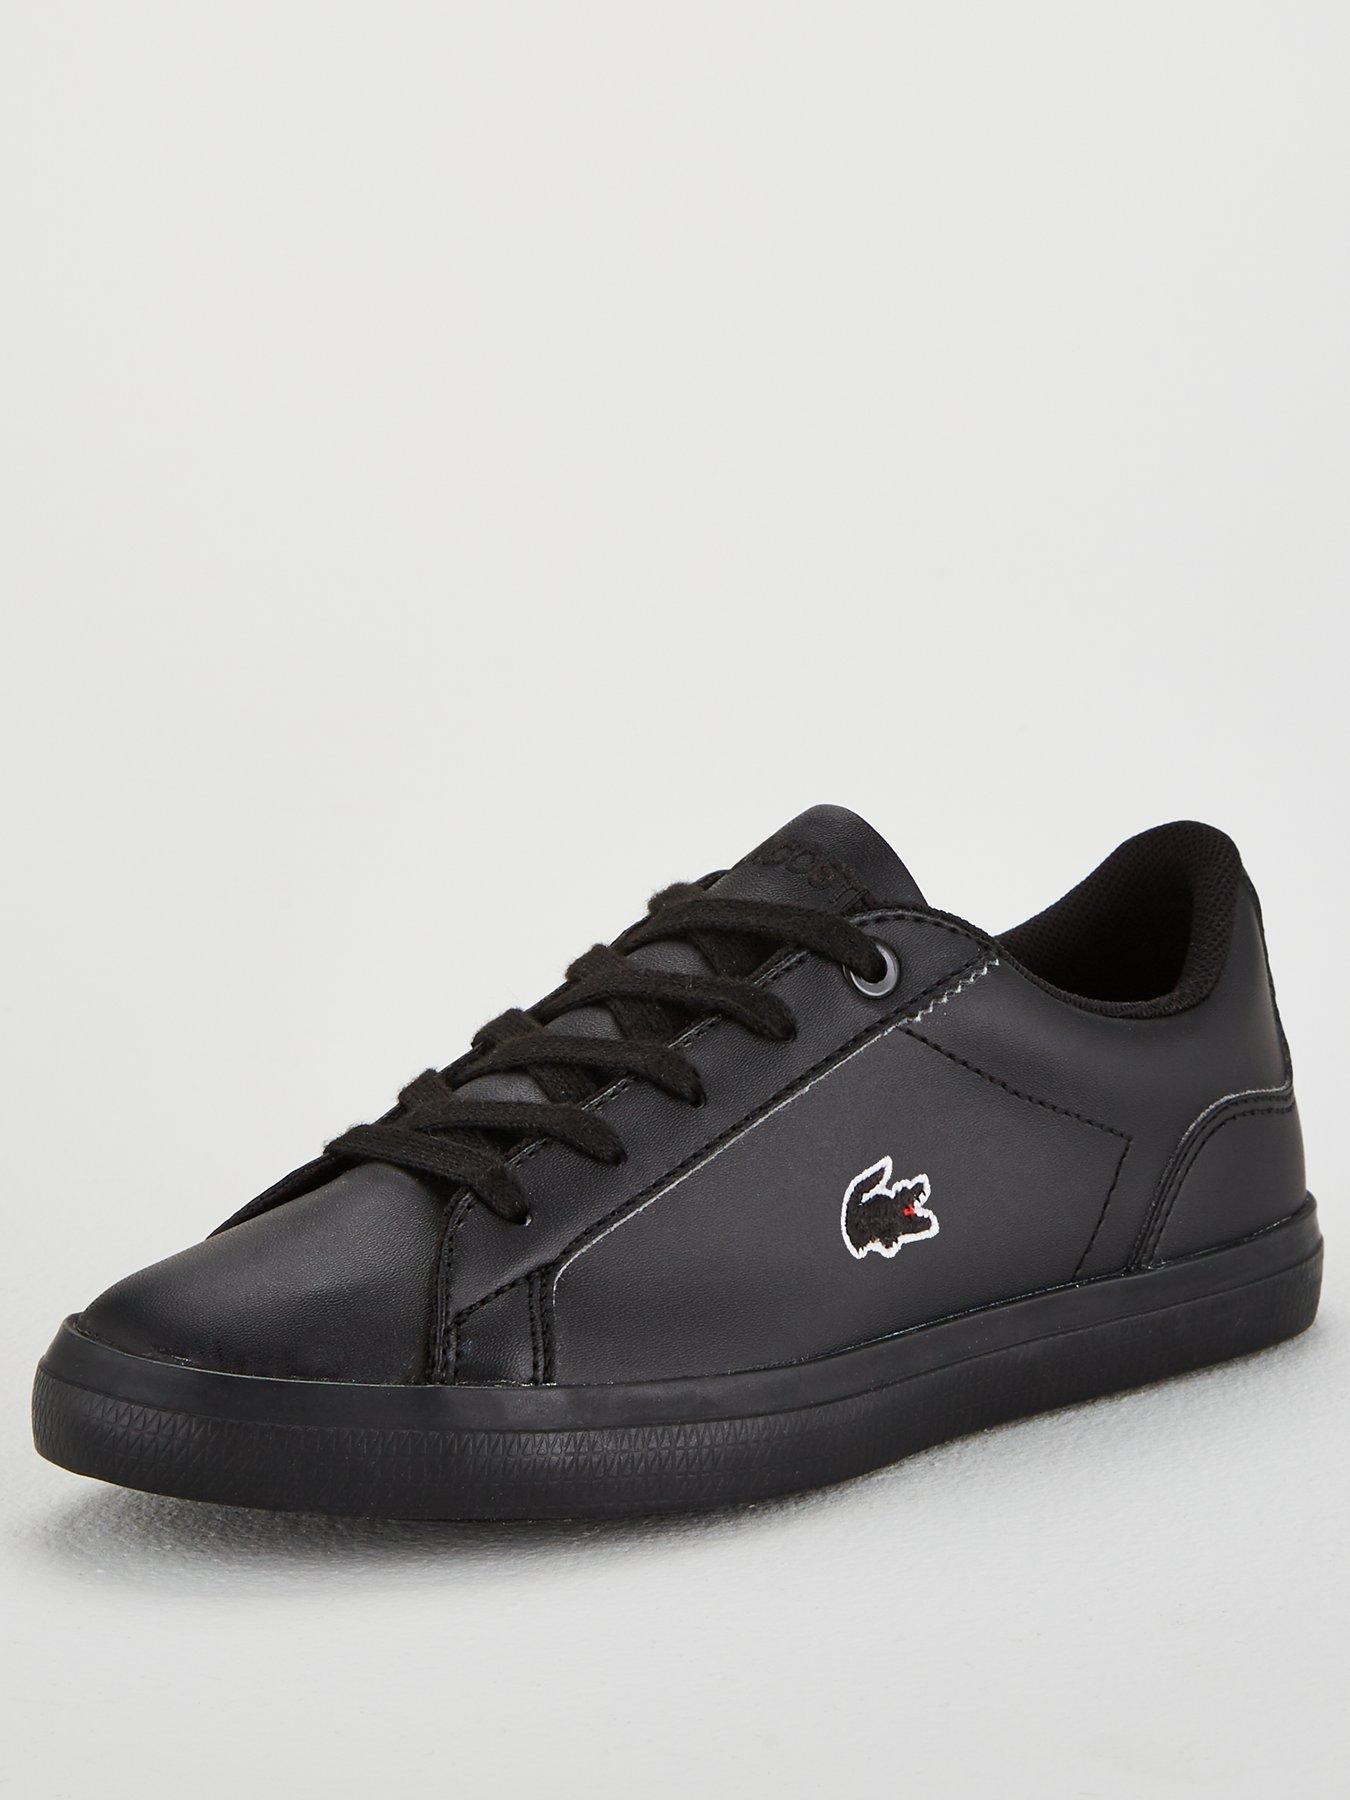 Lacoste   Kids \u0026 baby sports shoes